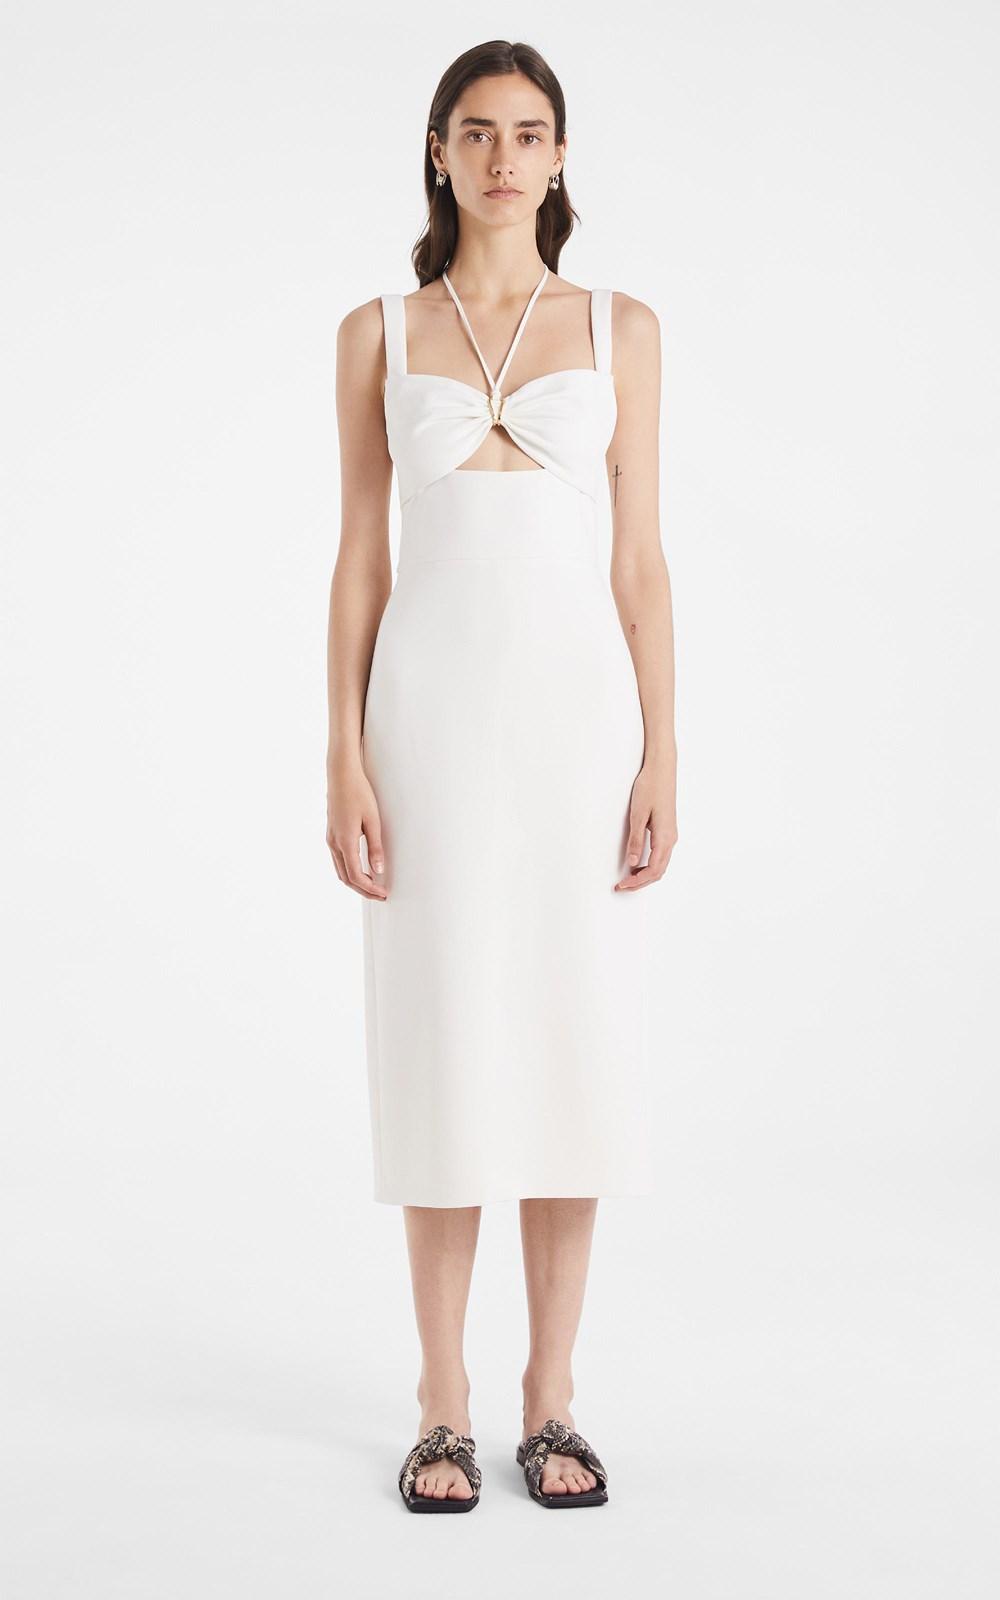 New  | SINGLE LINK CADY DRESS